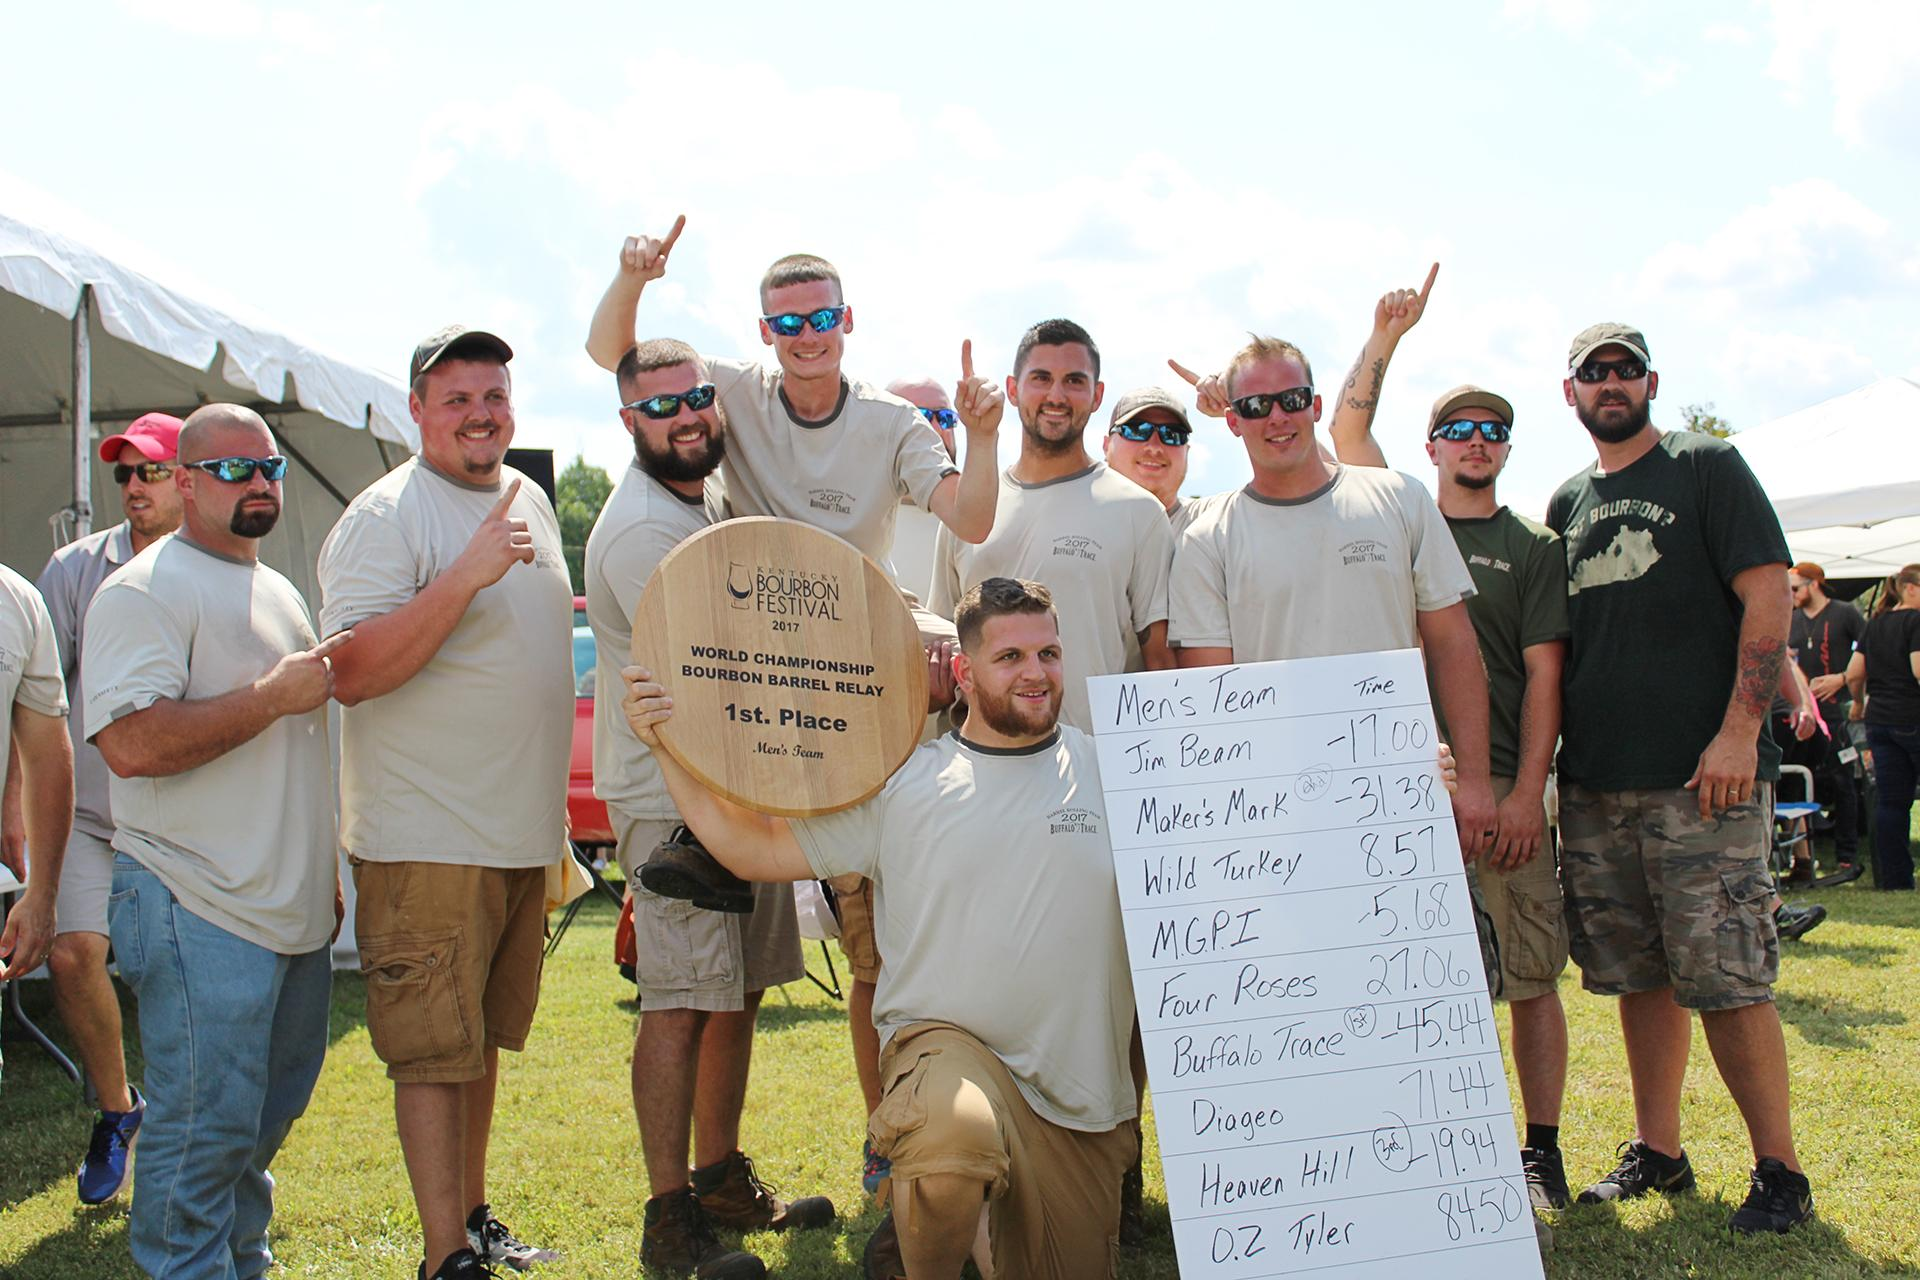 Buffalo Trace Men's Barrel Relay Team